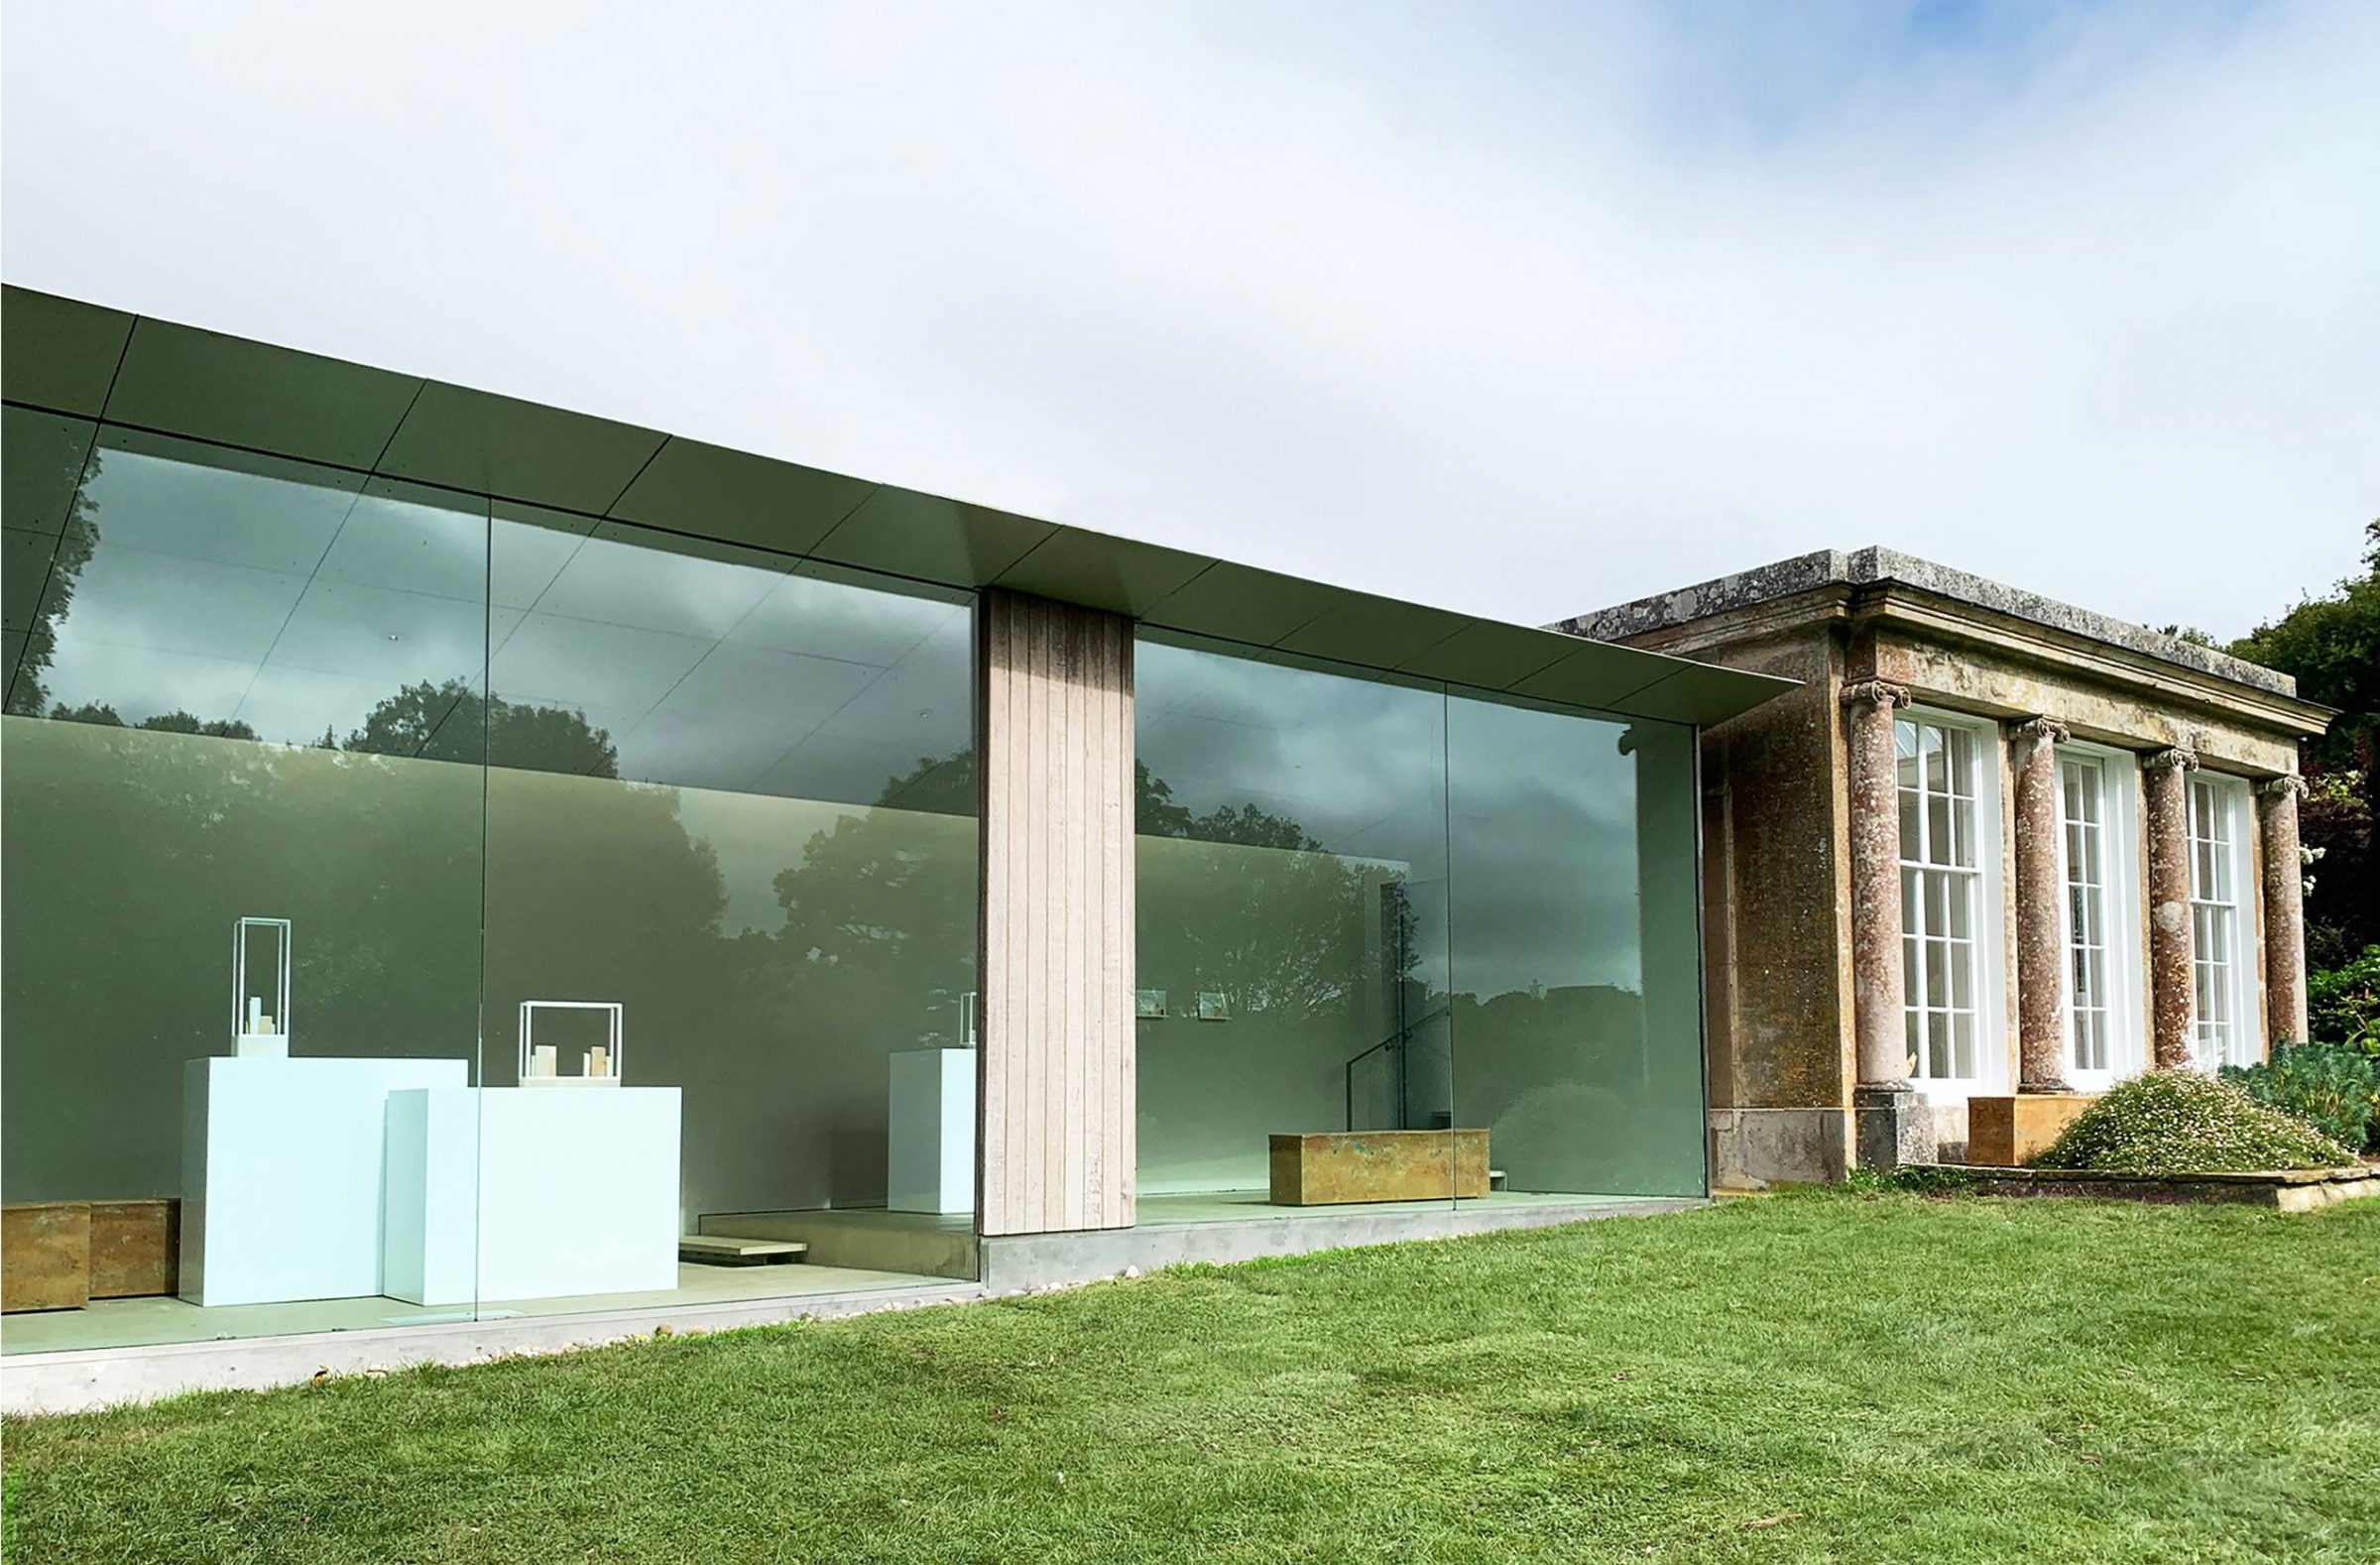 New Art Centre Edmund de Waal Tacet Sept 20 image 1 crop 2